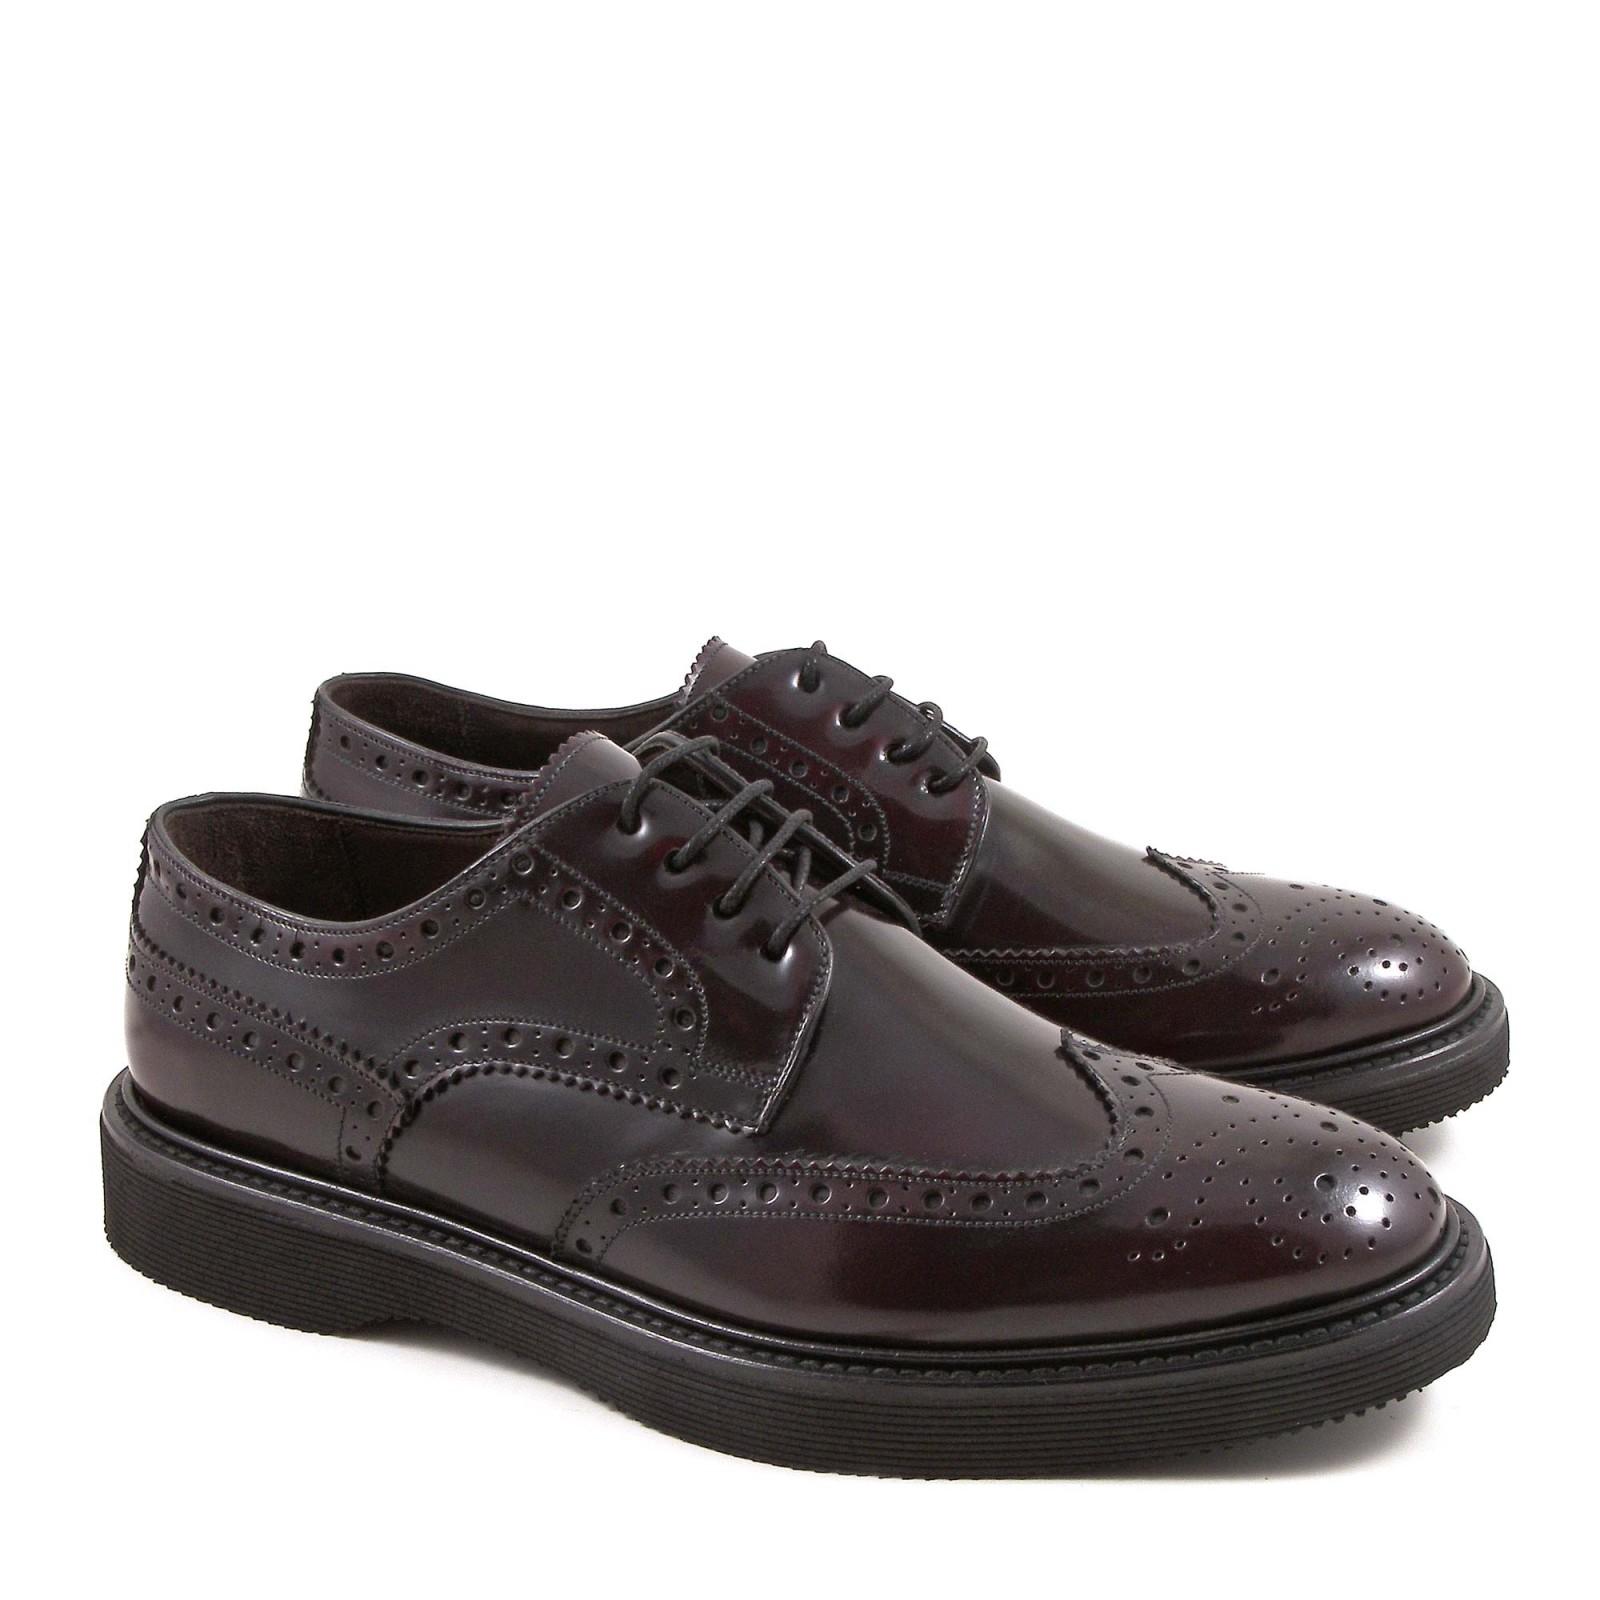 handmade s burgundy leather wingtip shoes